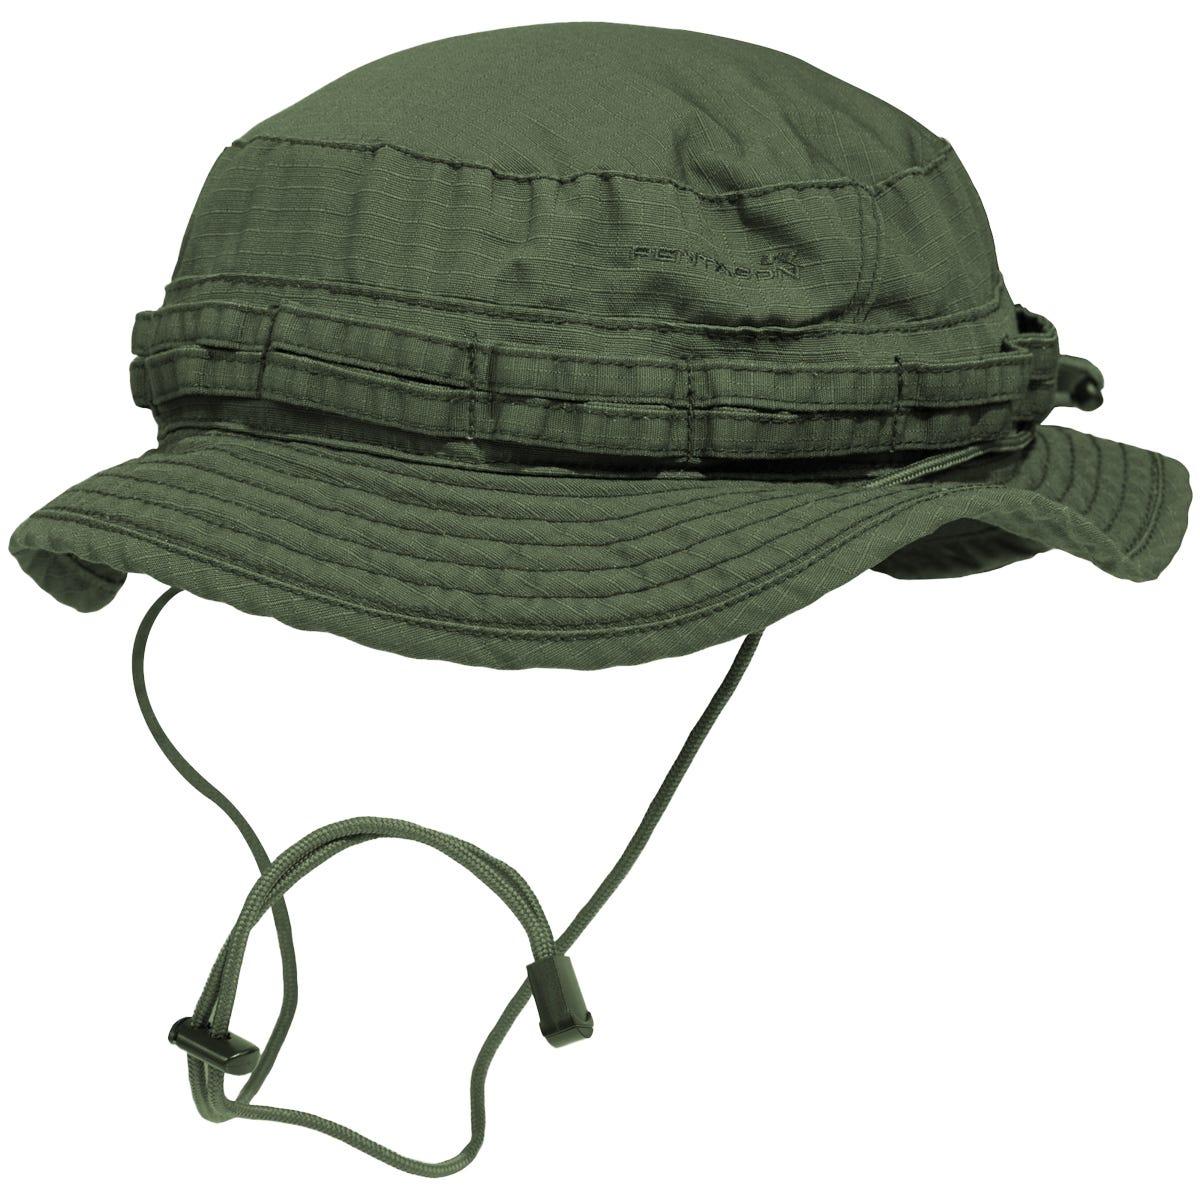 d2f7e3c11ad Pentagon Babylon Boonie Hat Camo Green